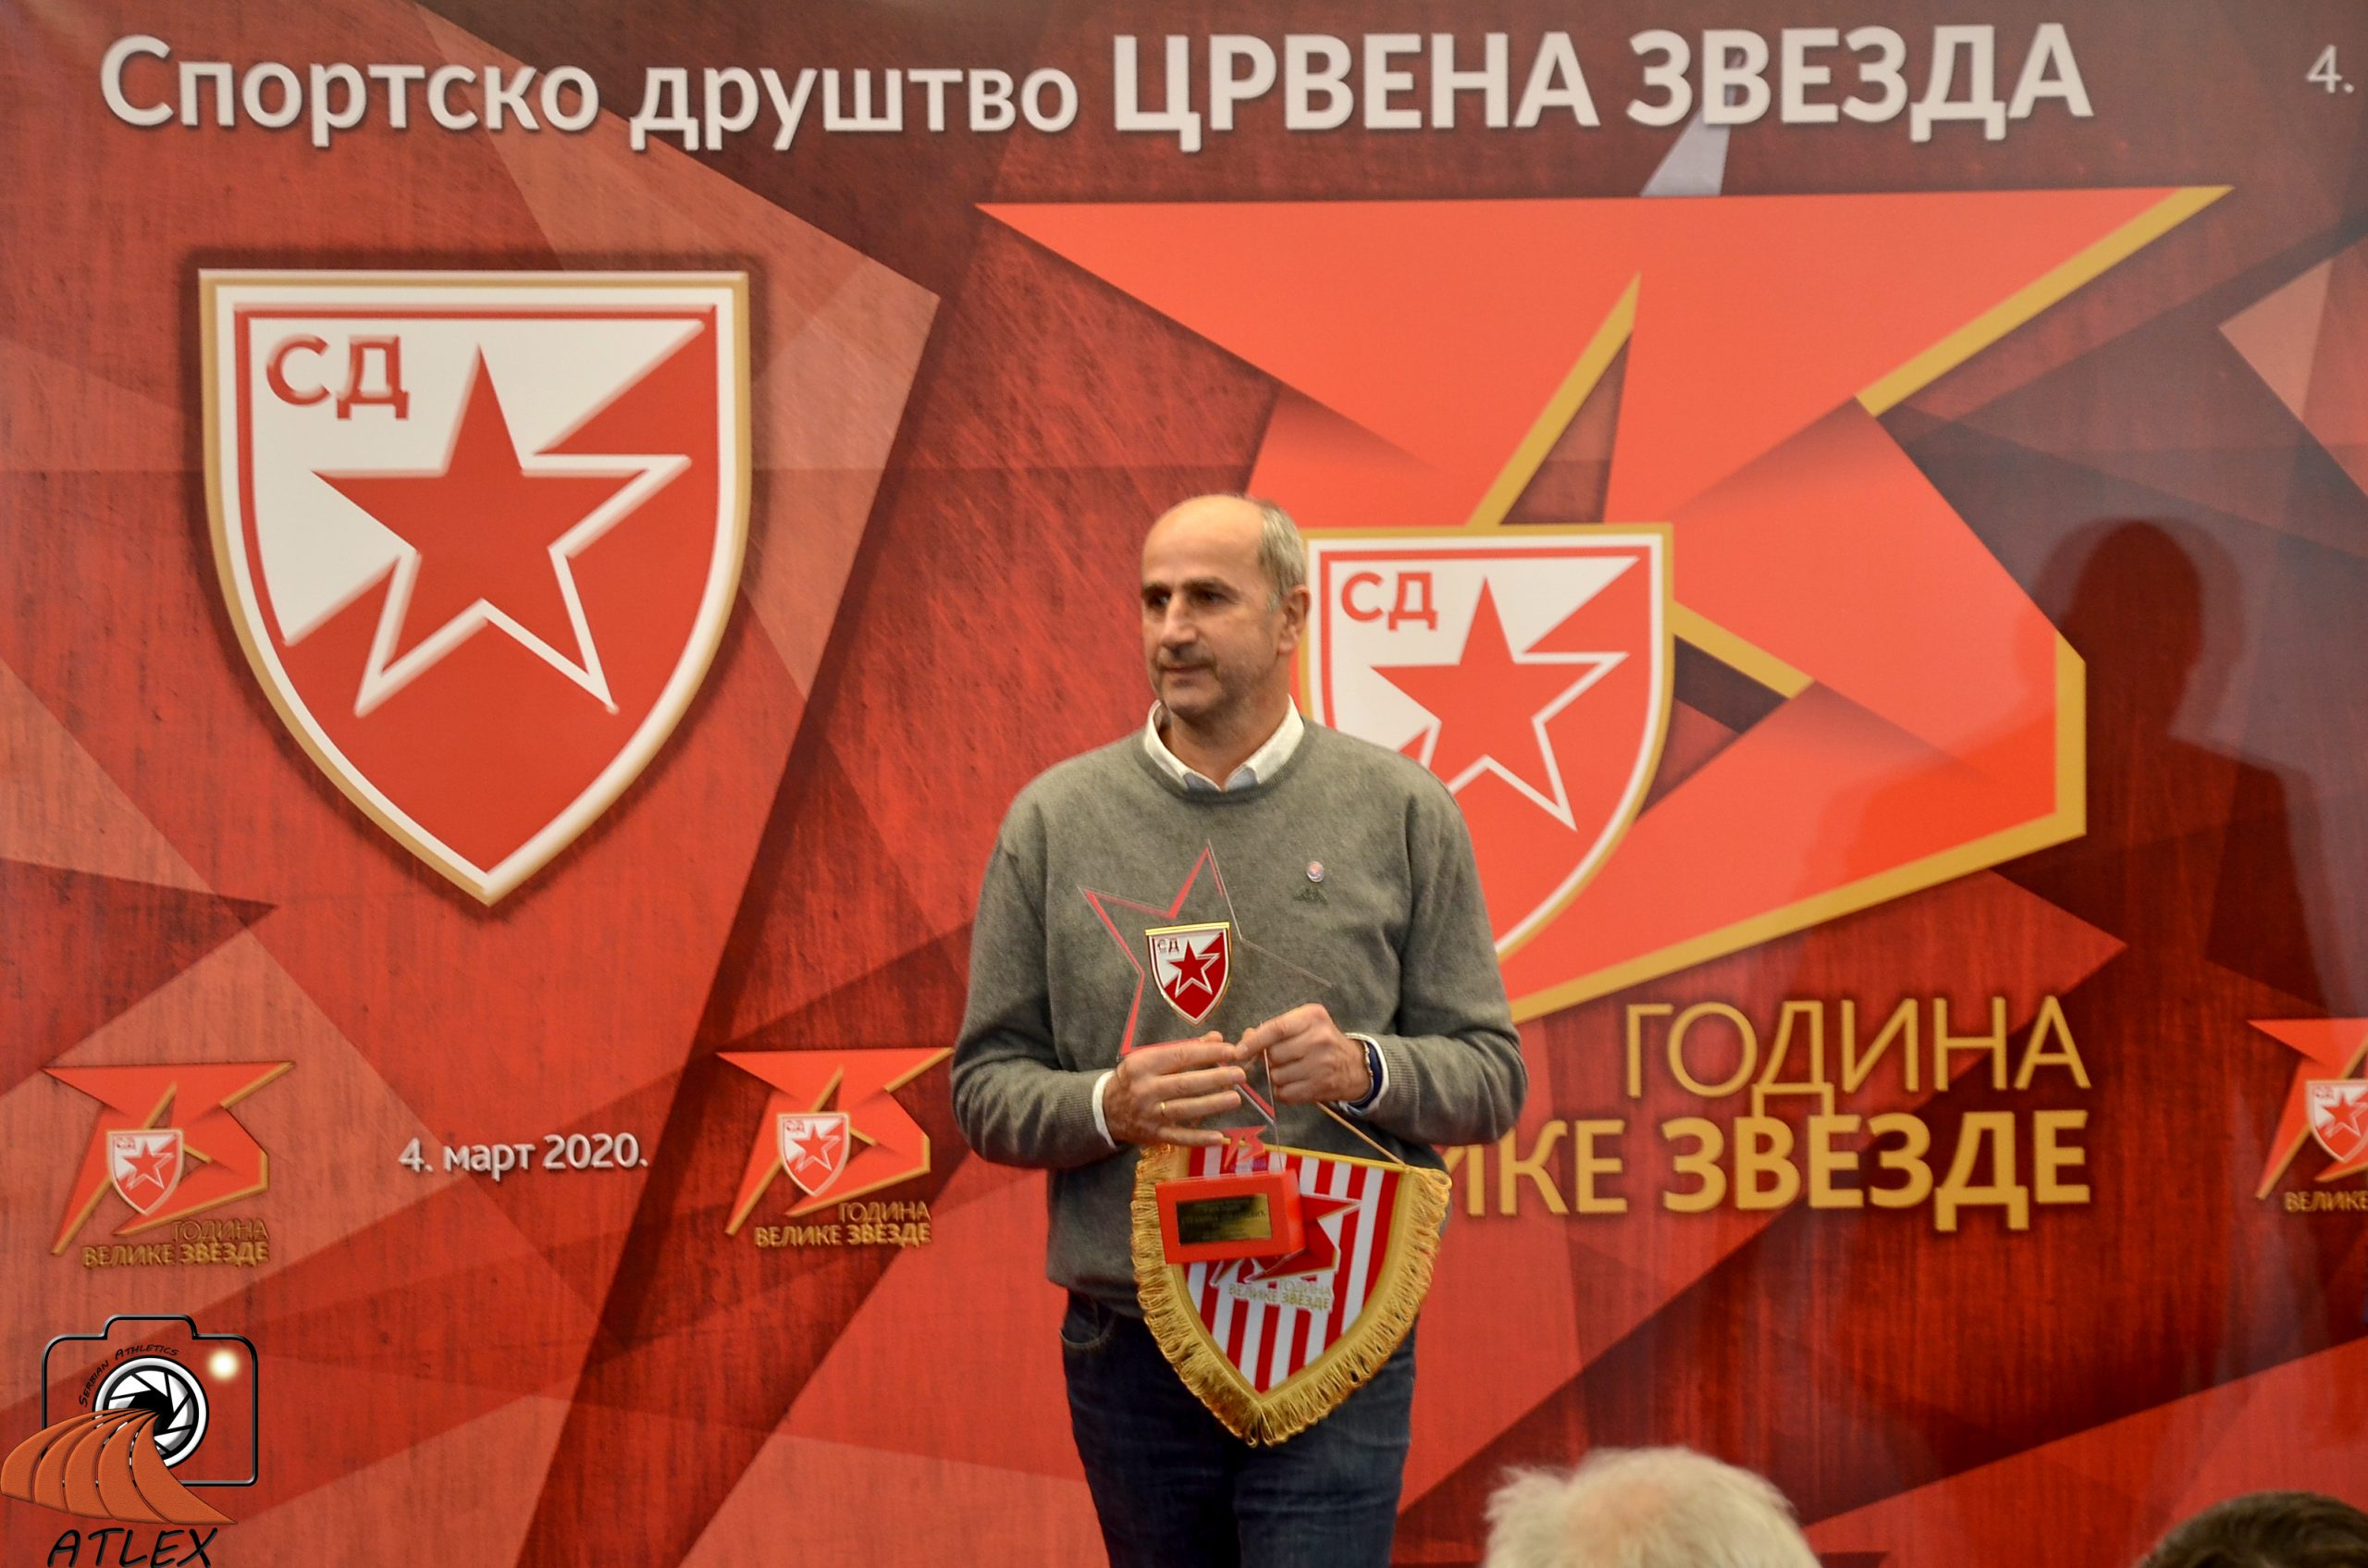 Milorad Jovančević, 75. rođendan SD Crvena zvezda